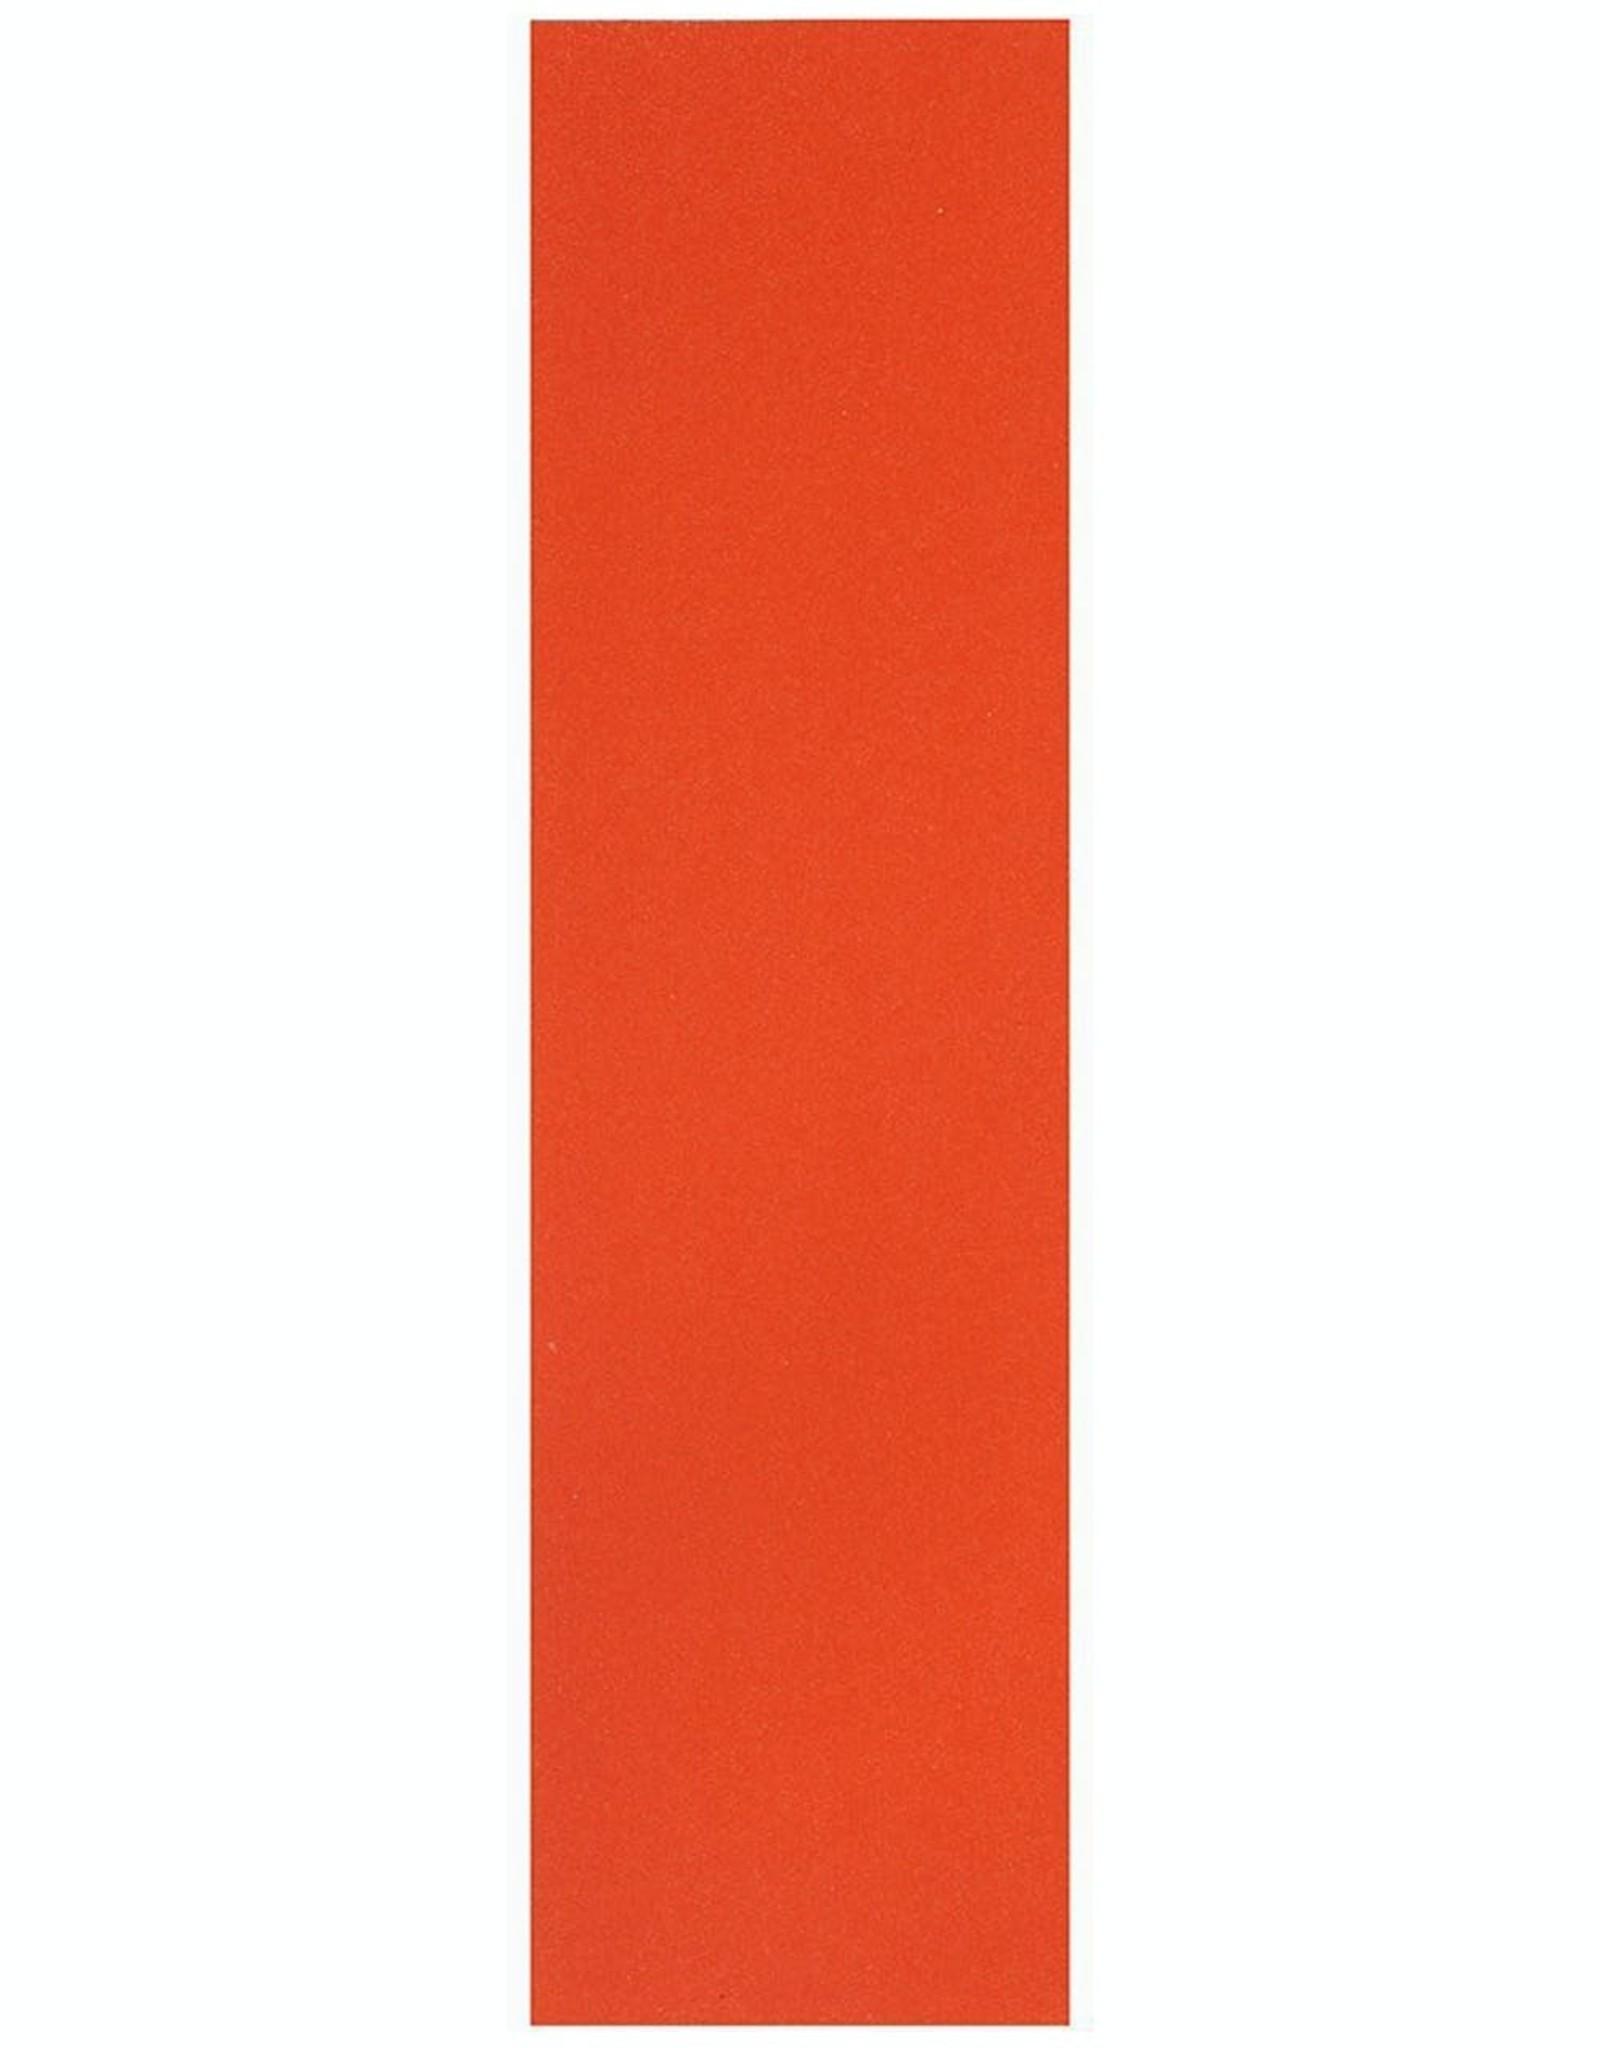 JESSUP JESSUP GRIP SHEET (SINGLE) - COLORED (9) Orange